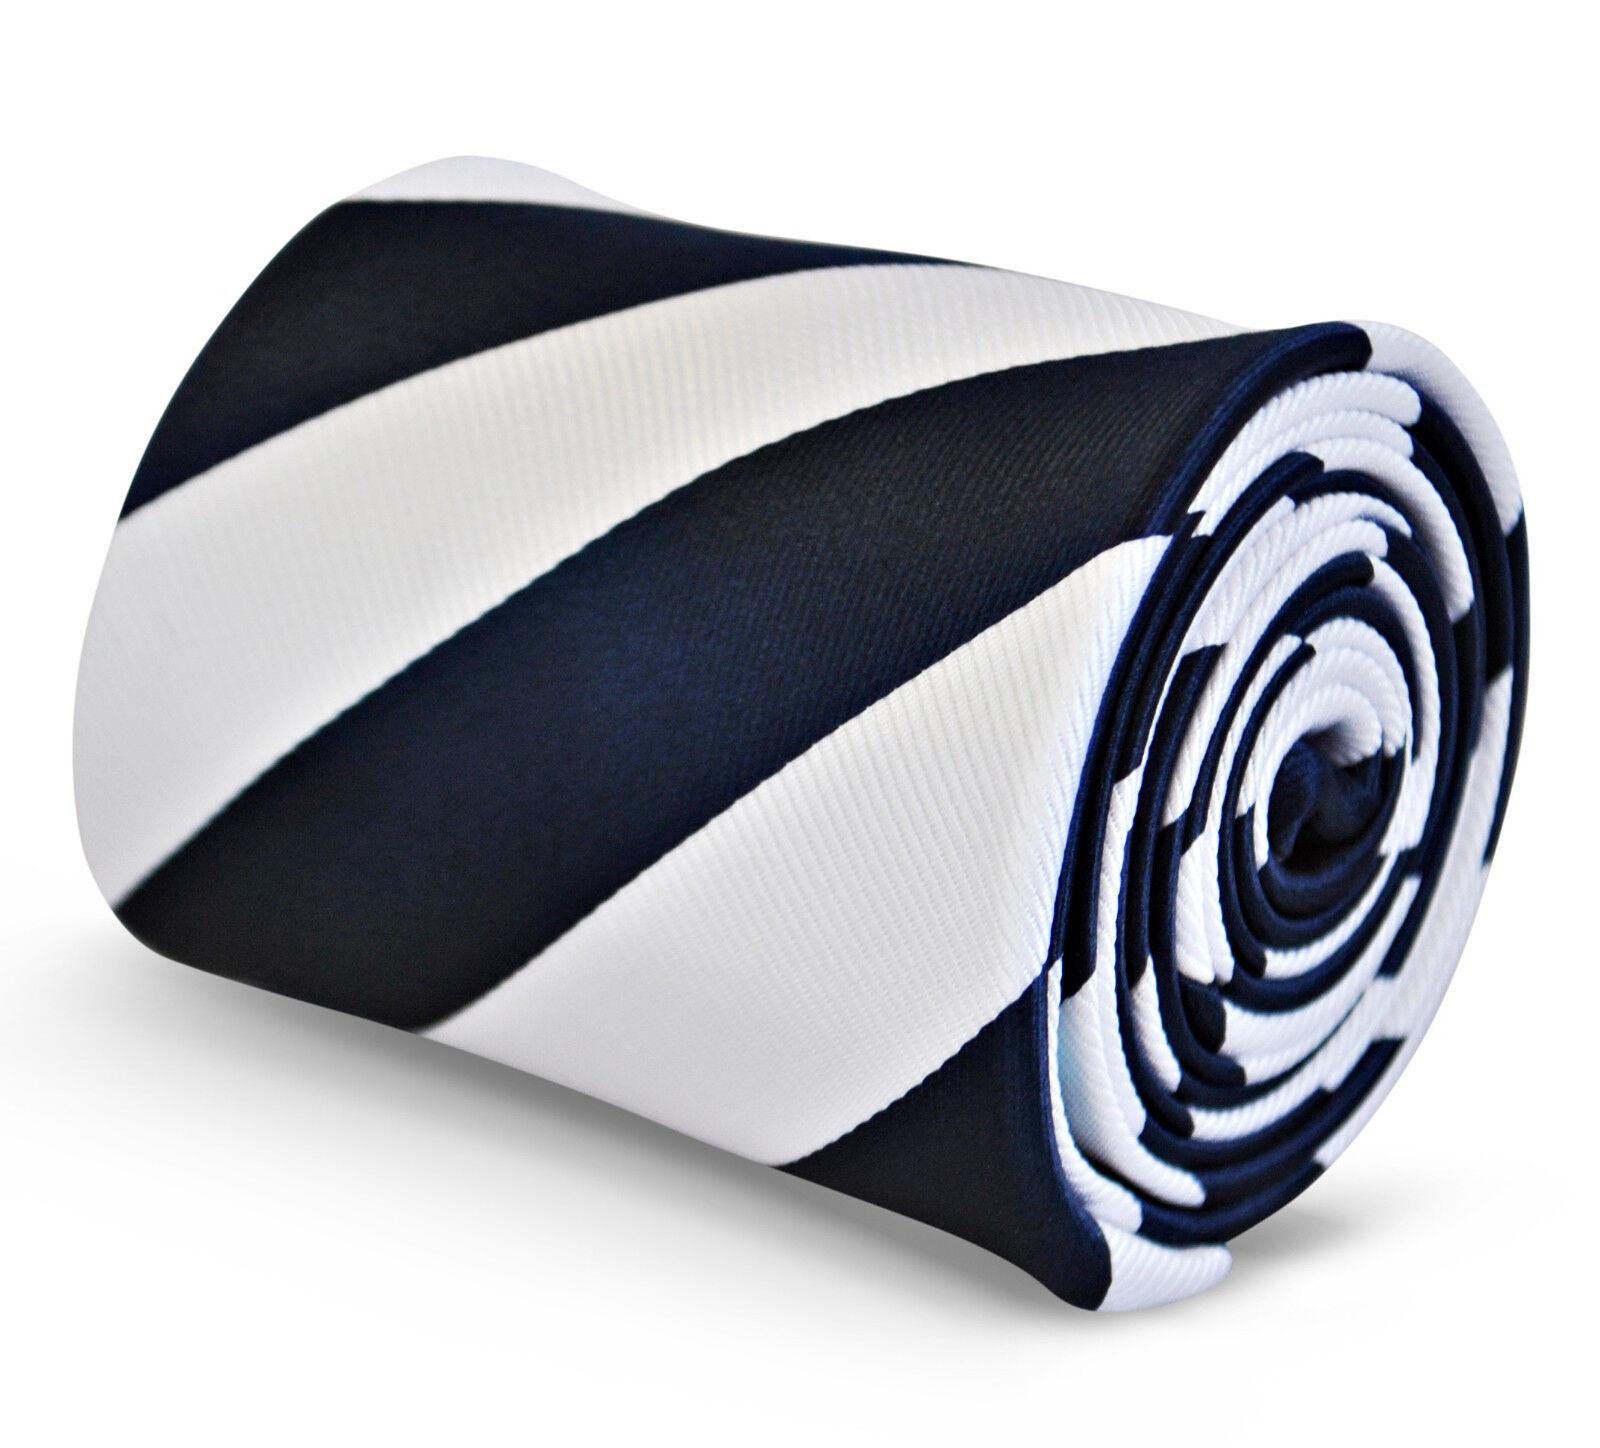 Frederick Thomas Designer Herren Krawatte - Dunkel Marineblau & Weiß - Repp Club